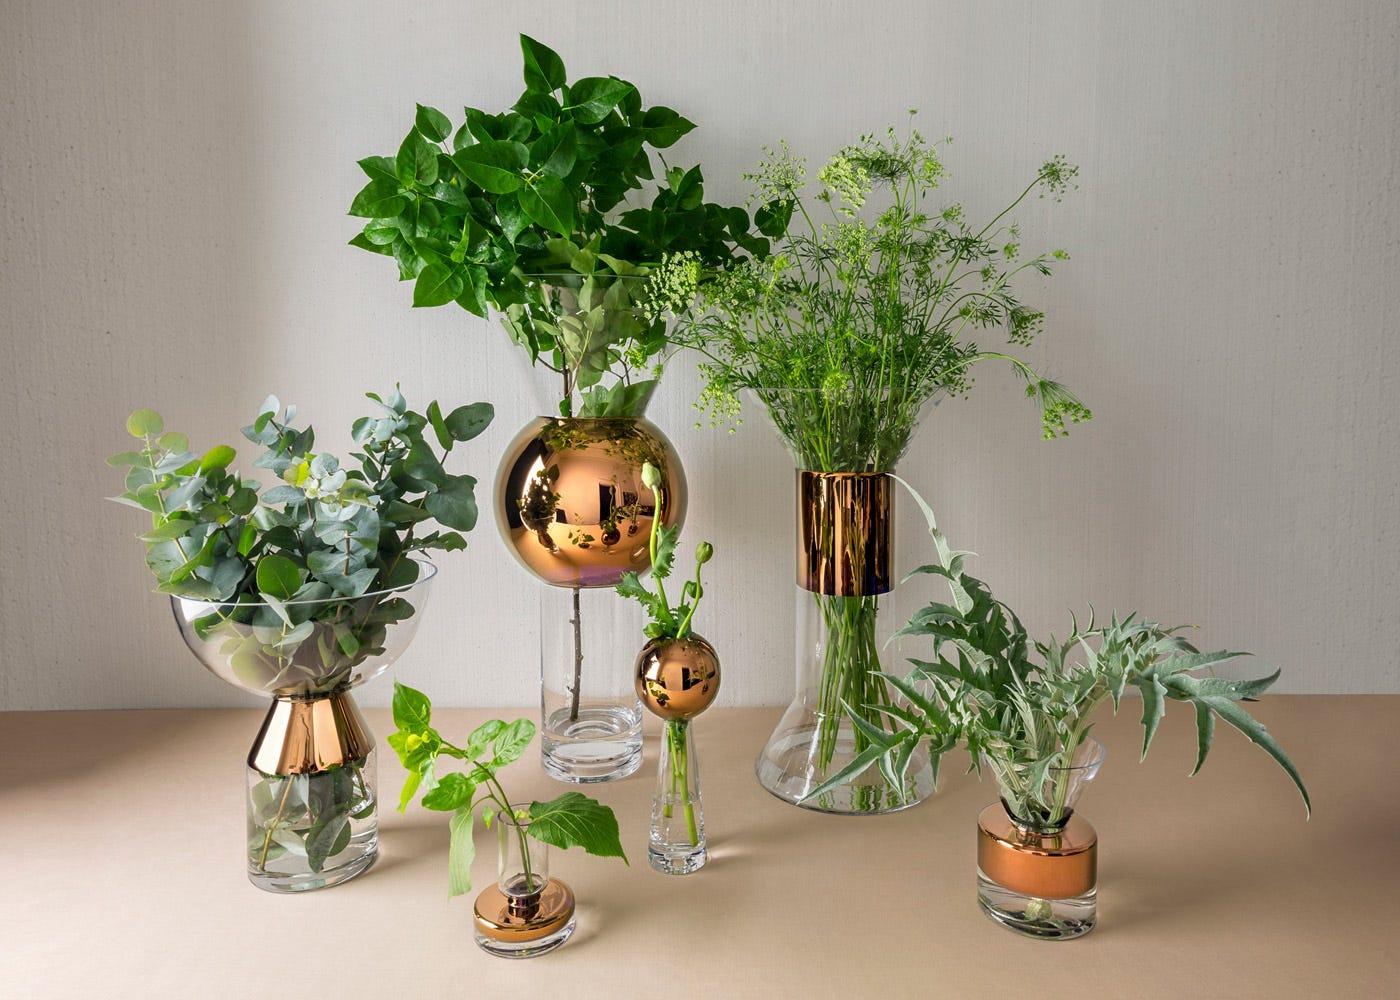 Stem Vase seen in the centre